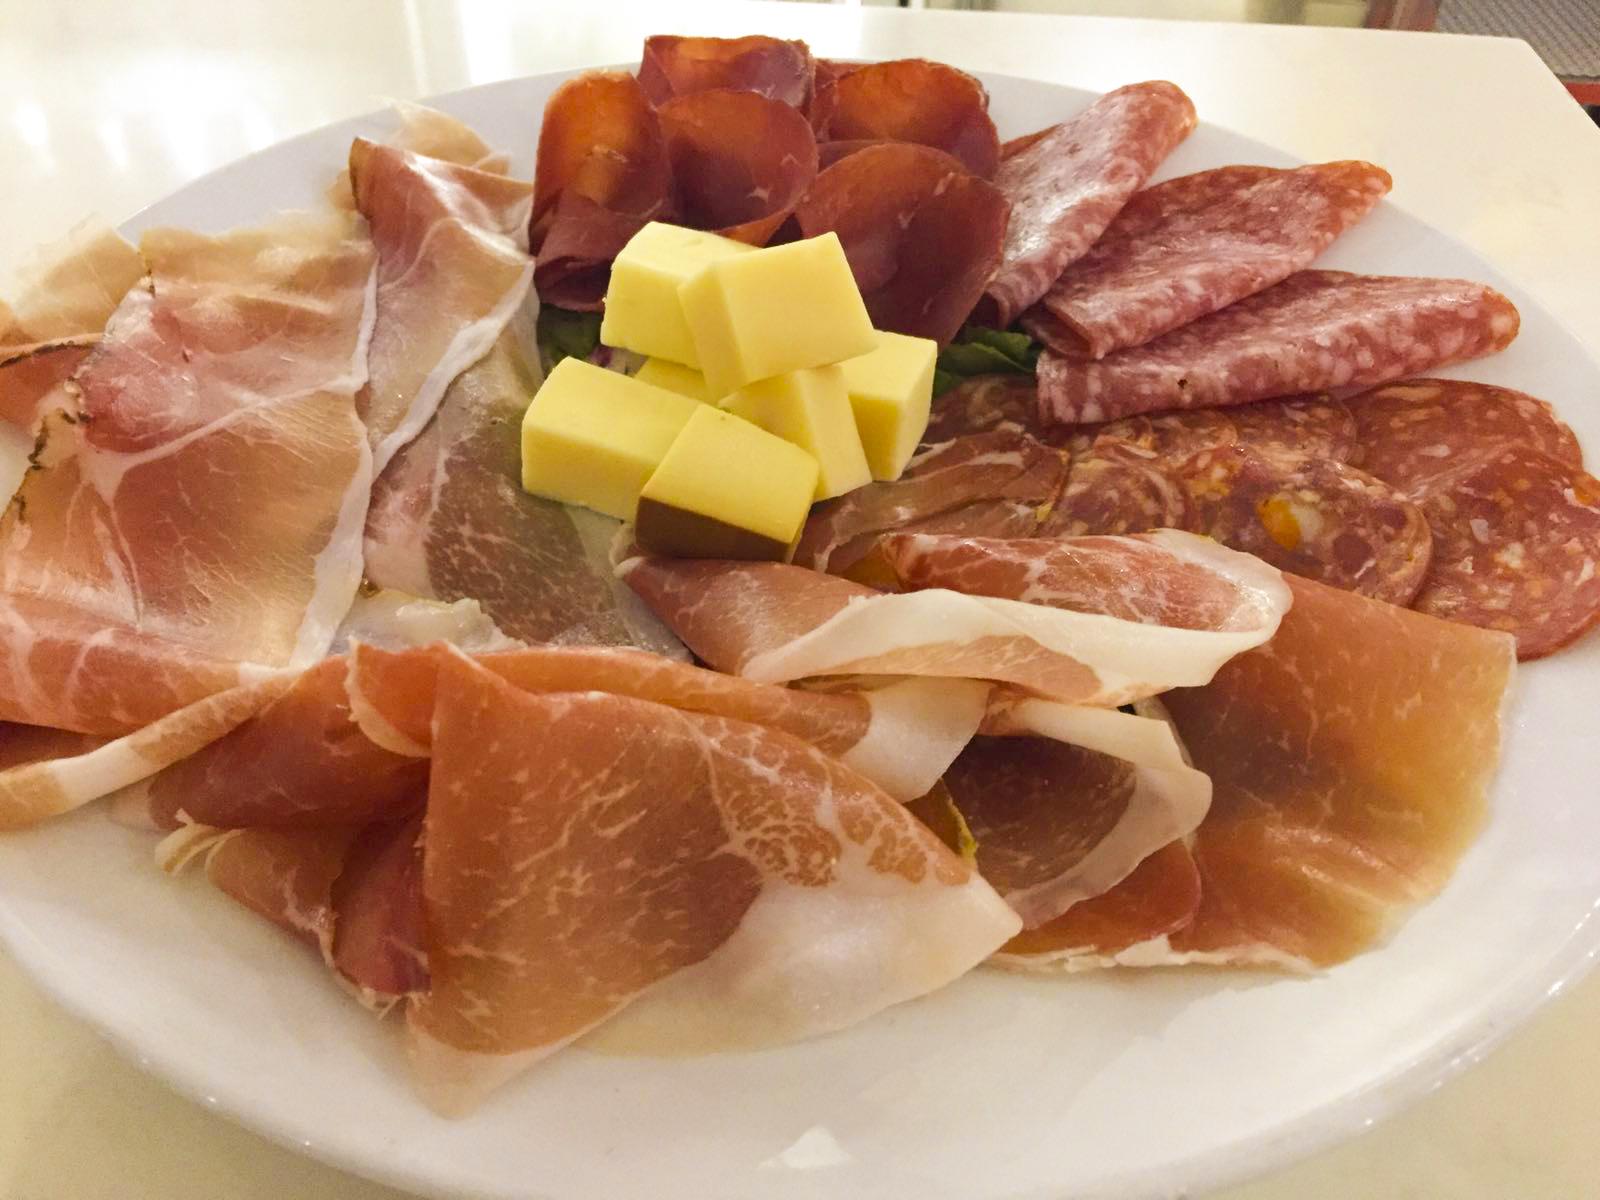 Trattoria Pizzeria Mezzaluna Digital Faro Canarias